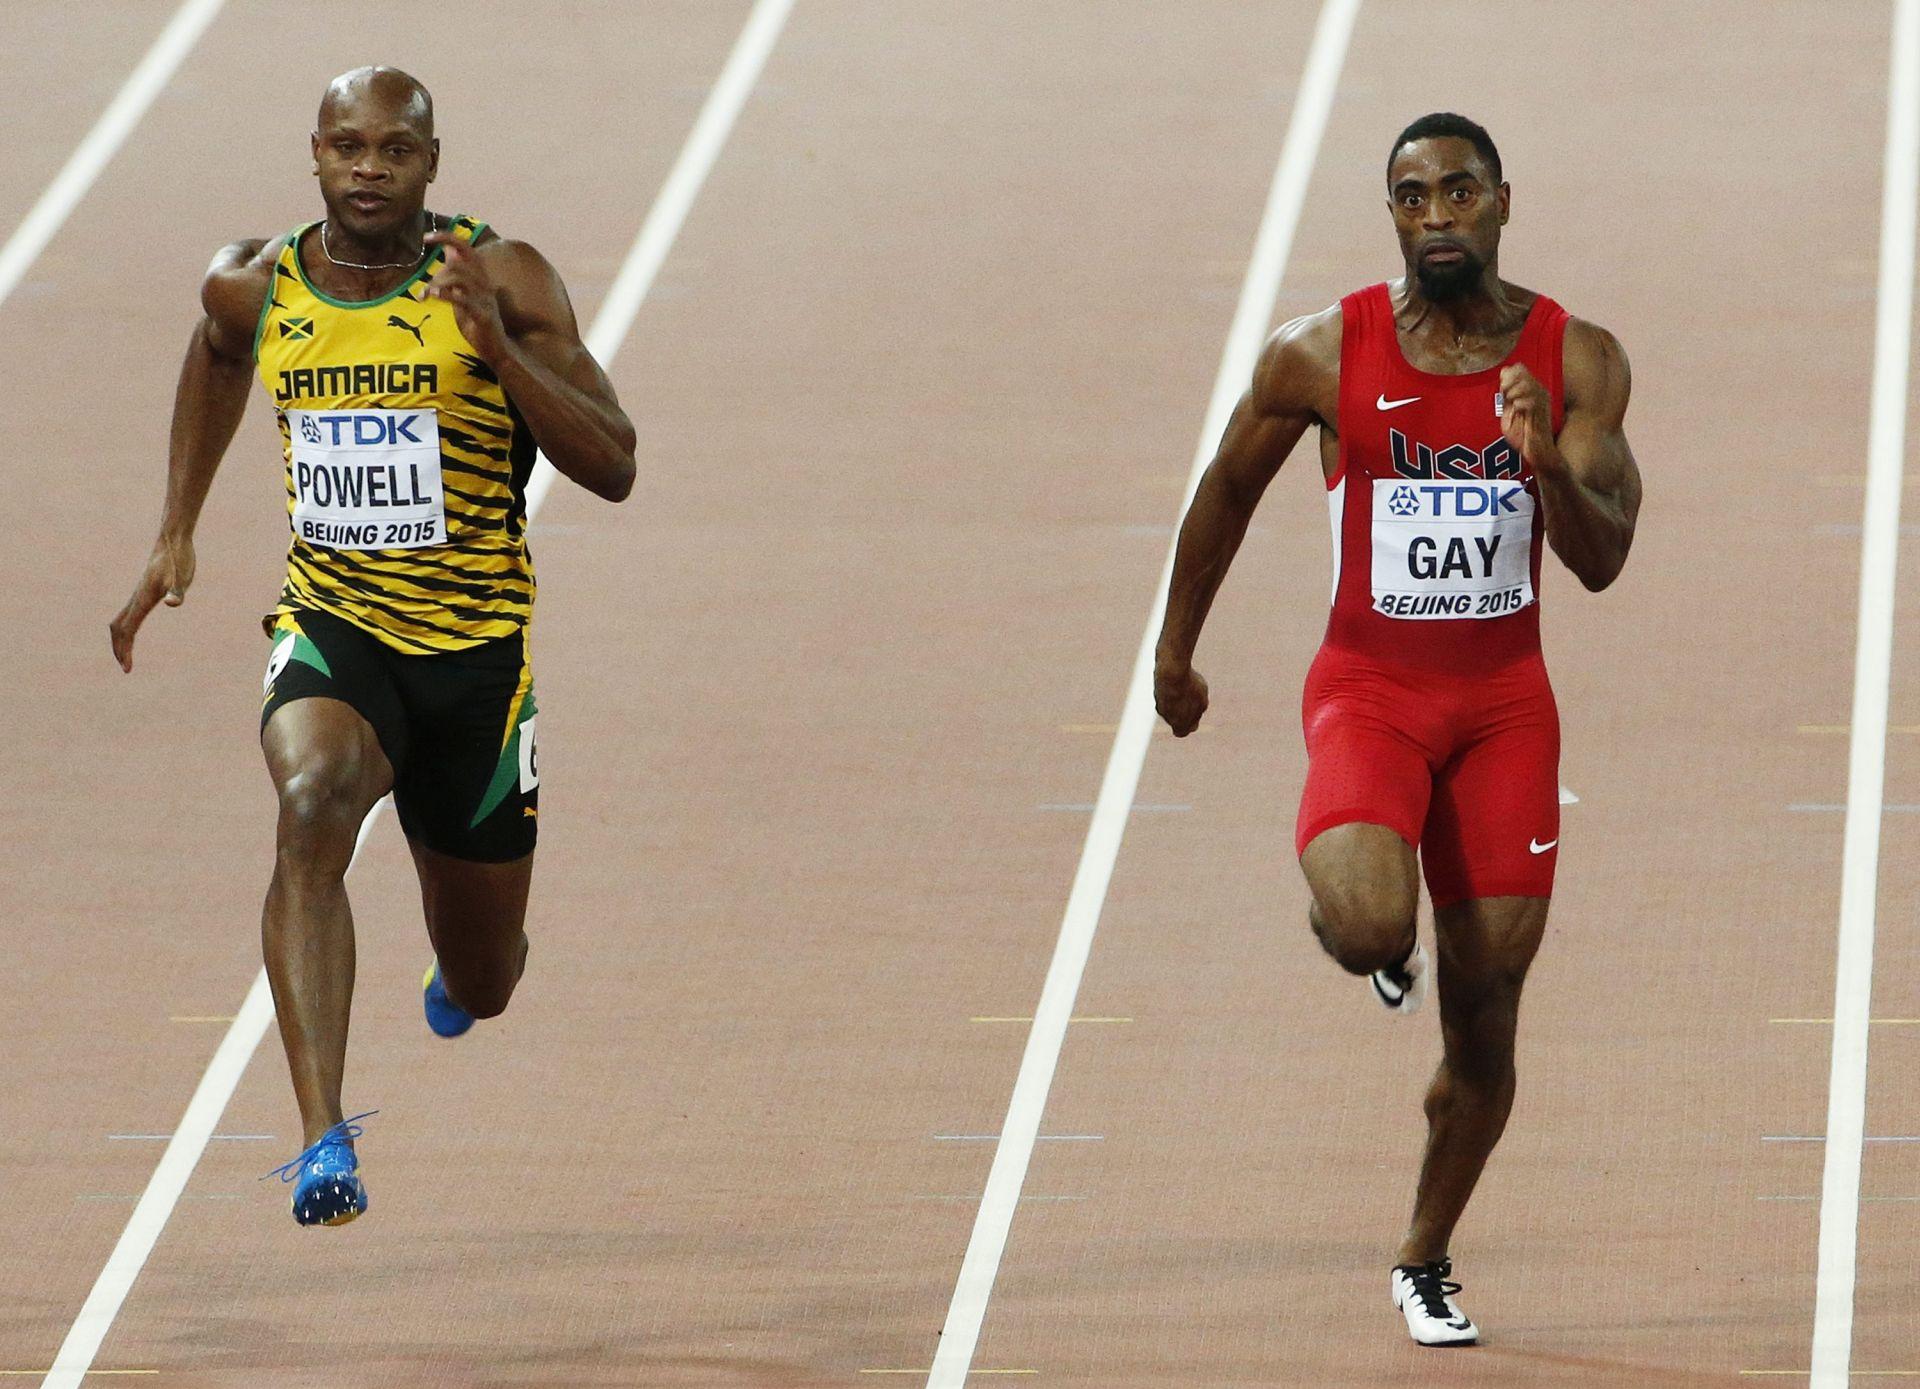 Asafa Powell u Zagrebu: Napast ću Boltov rekord